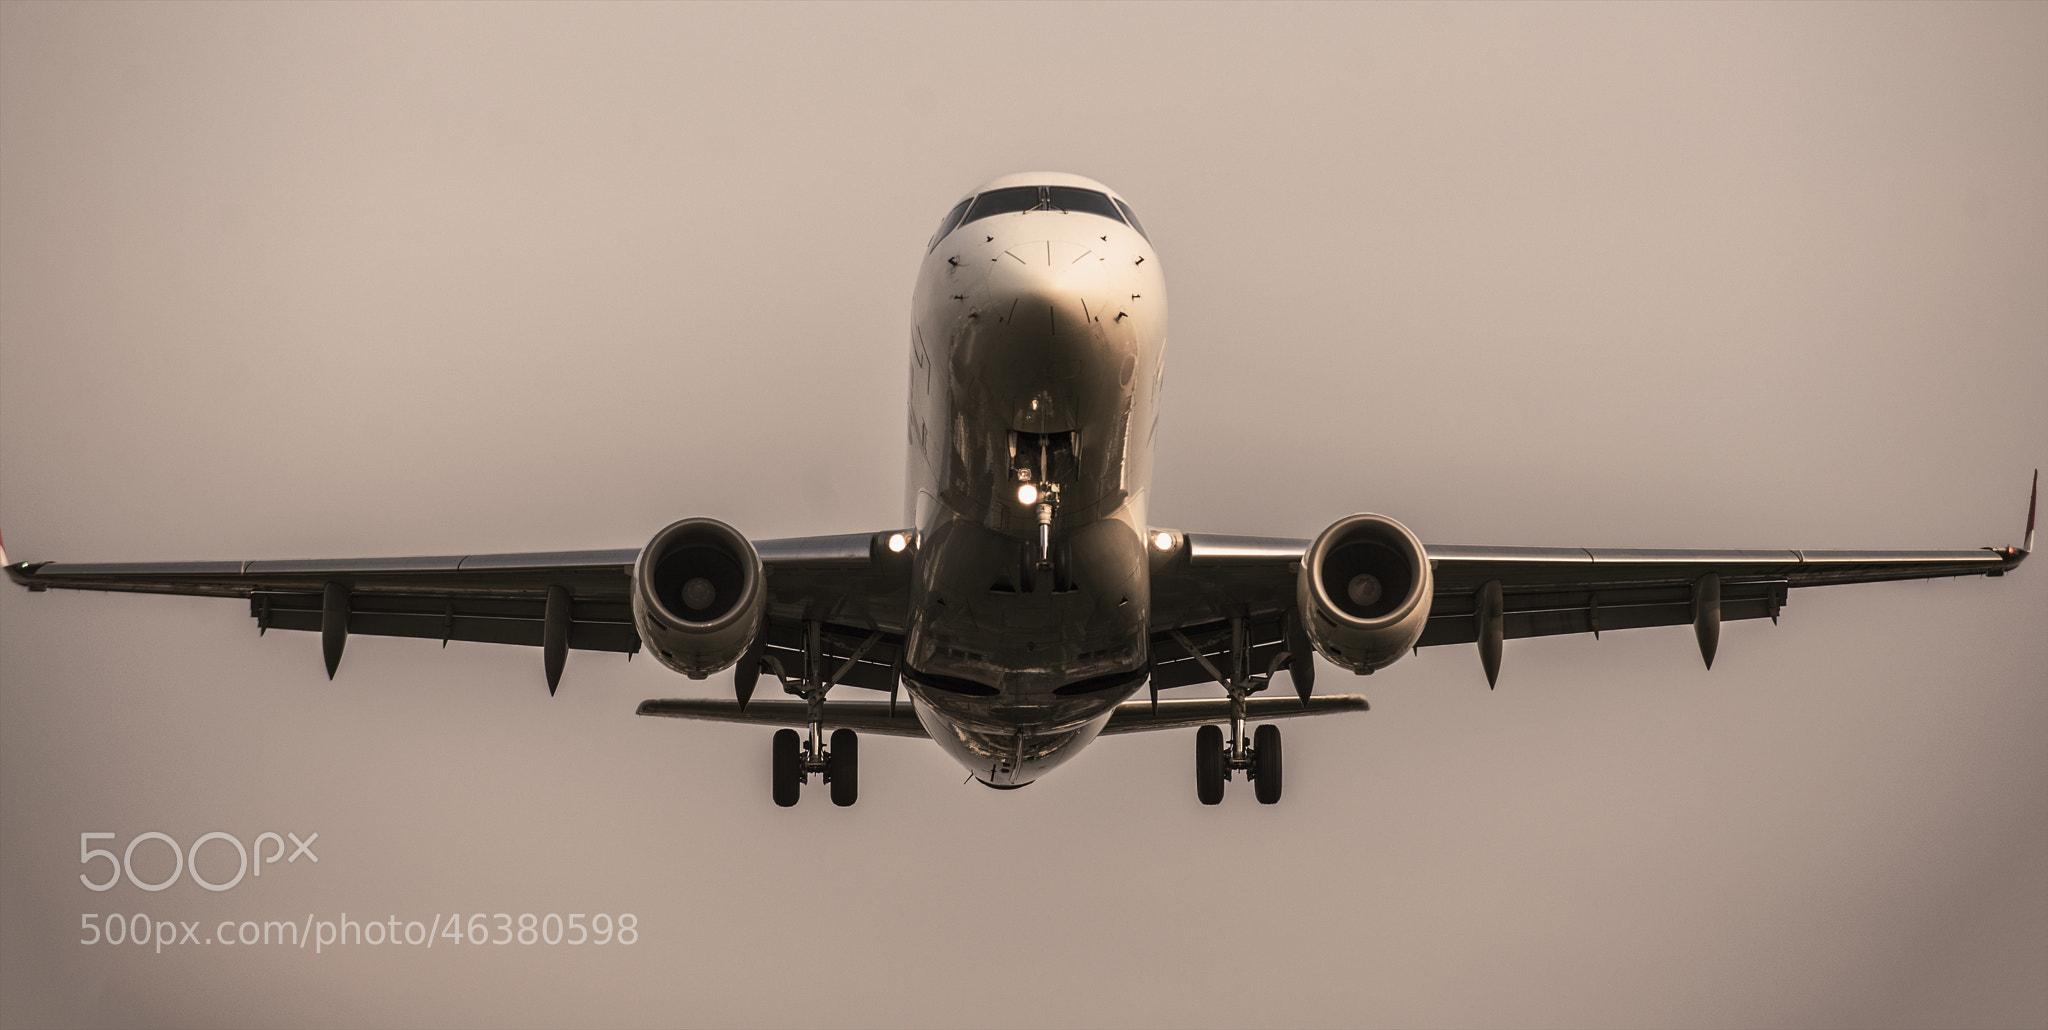 Photograph In Flight by hugh dornan on 500px